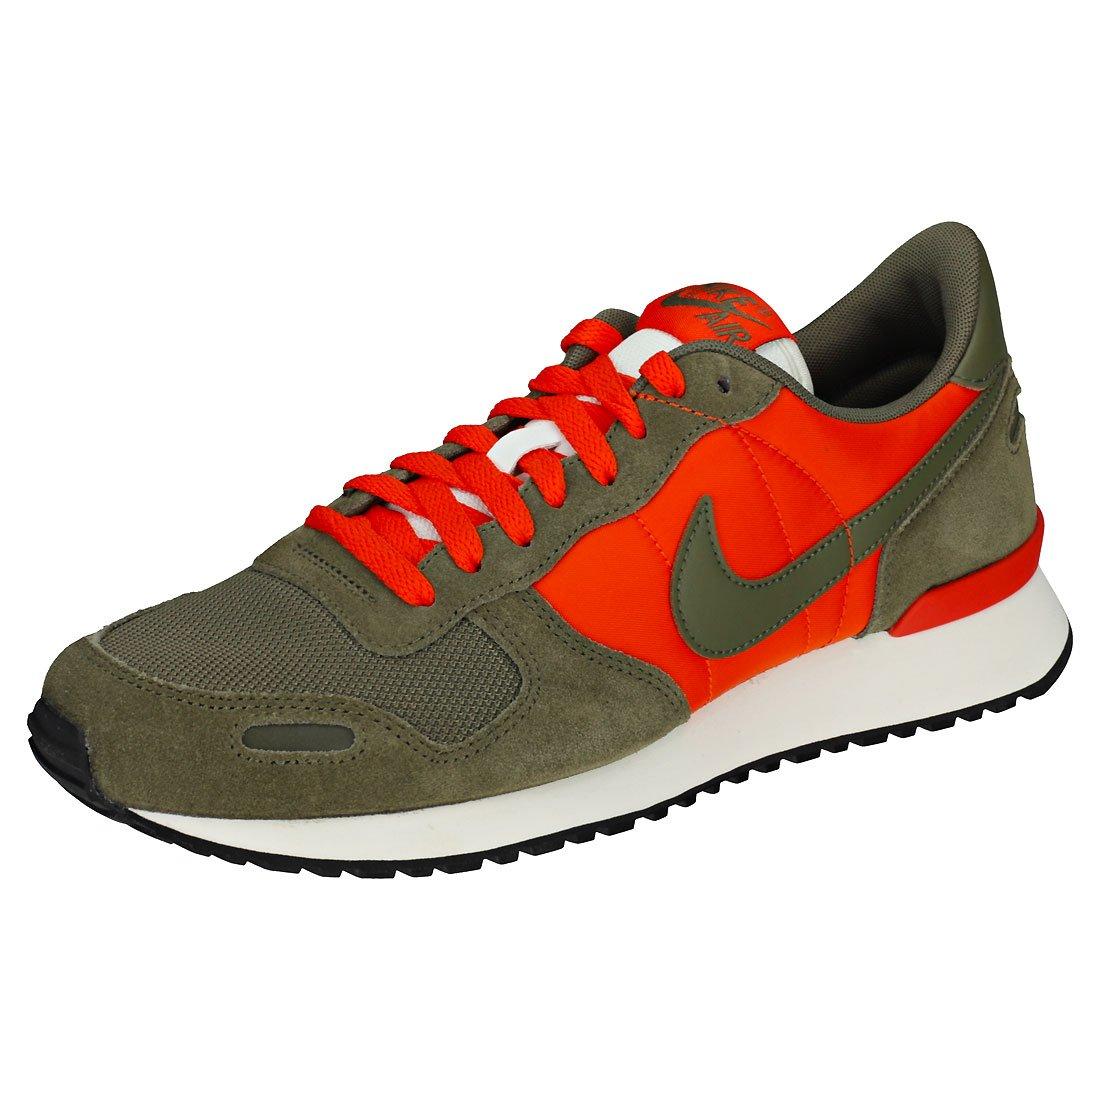 Nike Air Vrtx, Zapatillas de Running para Hombre 42 EU|Multicolor (Team Orange/Medium Olive/Sail/Black 801)